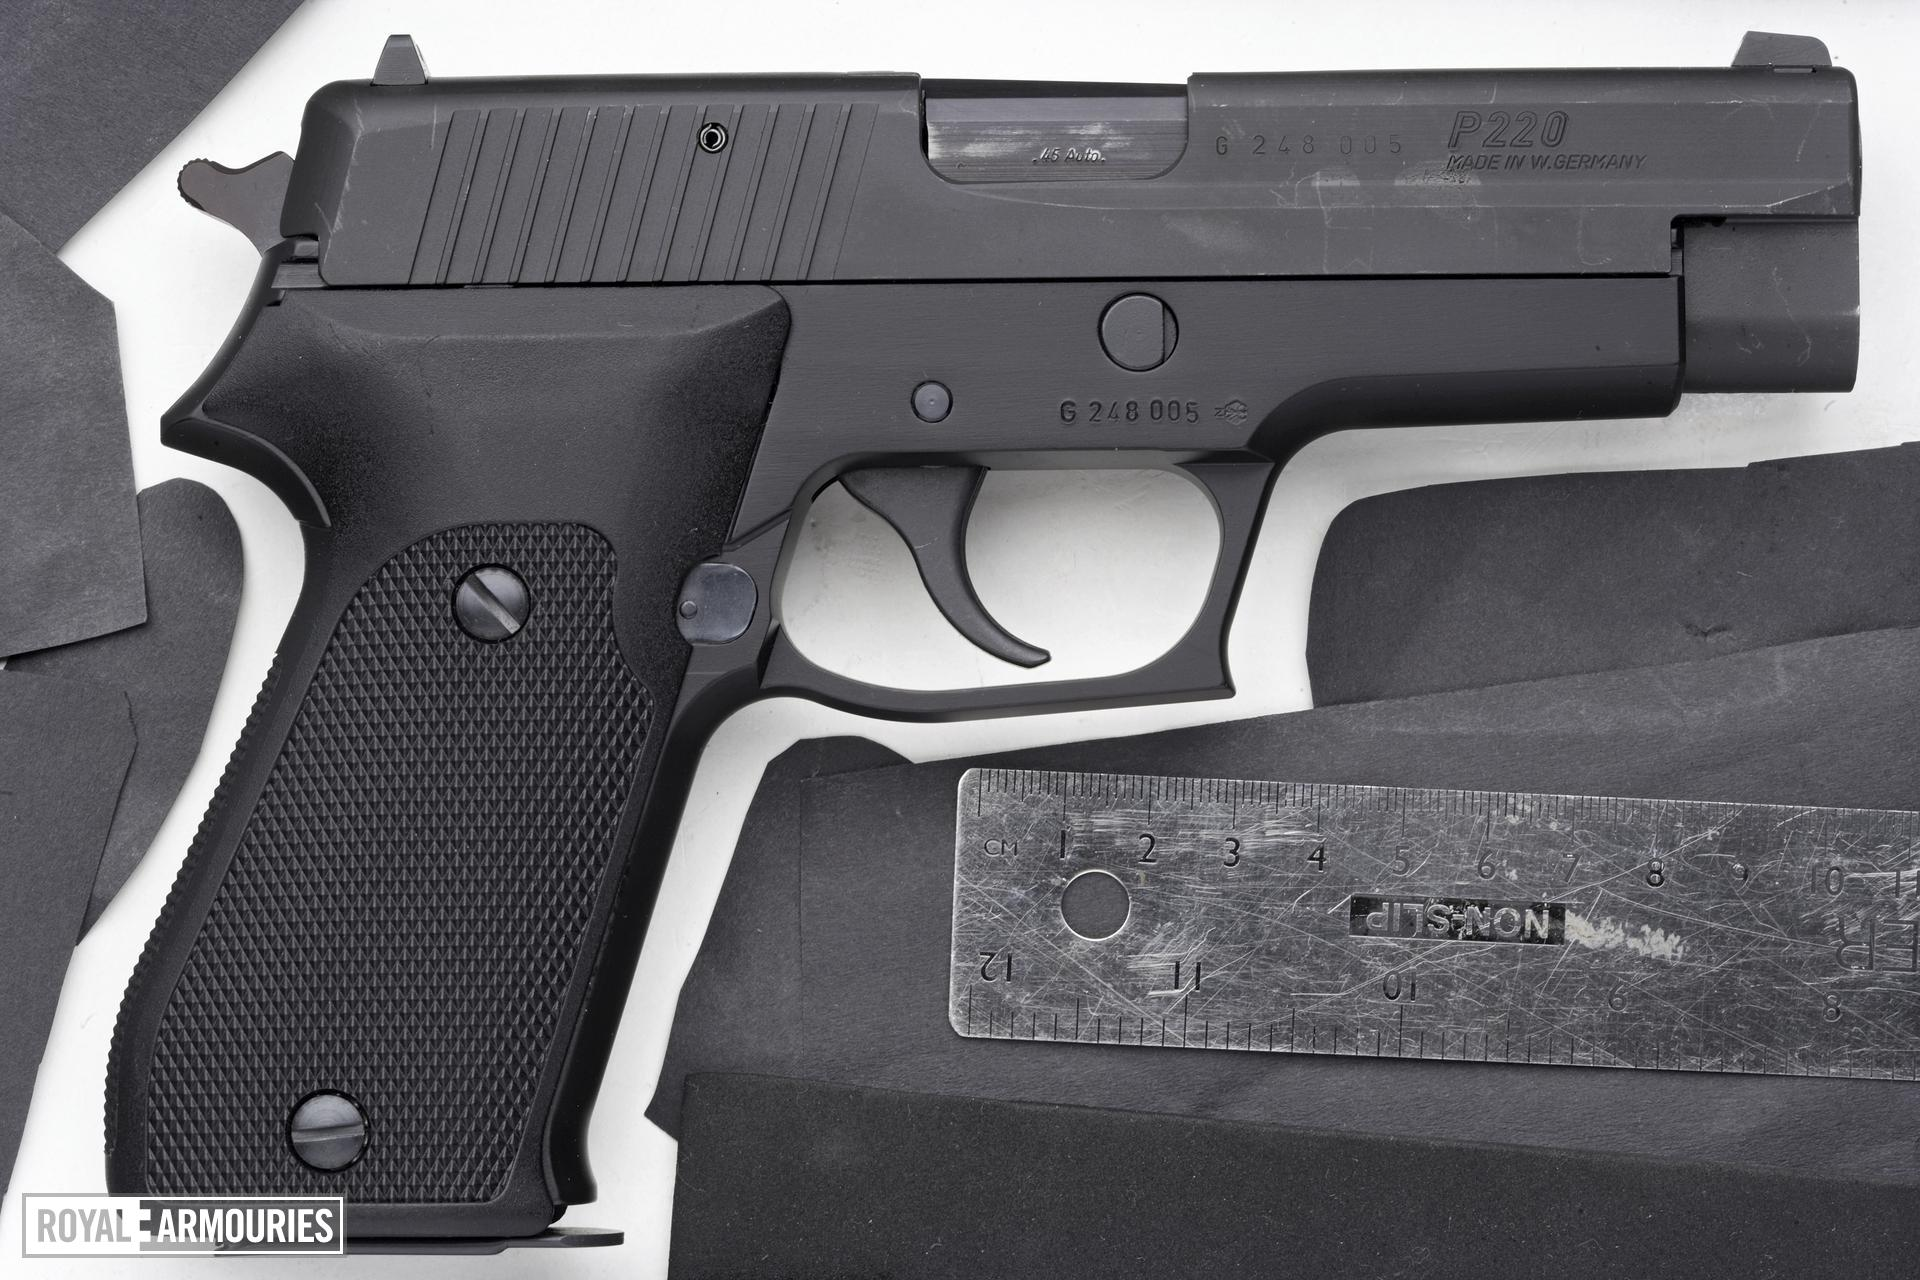 Centrefire self-loading pistol - SIG Sauer P220